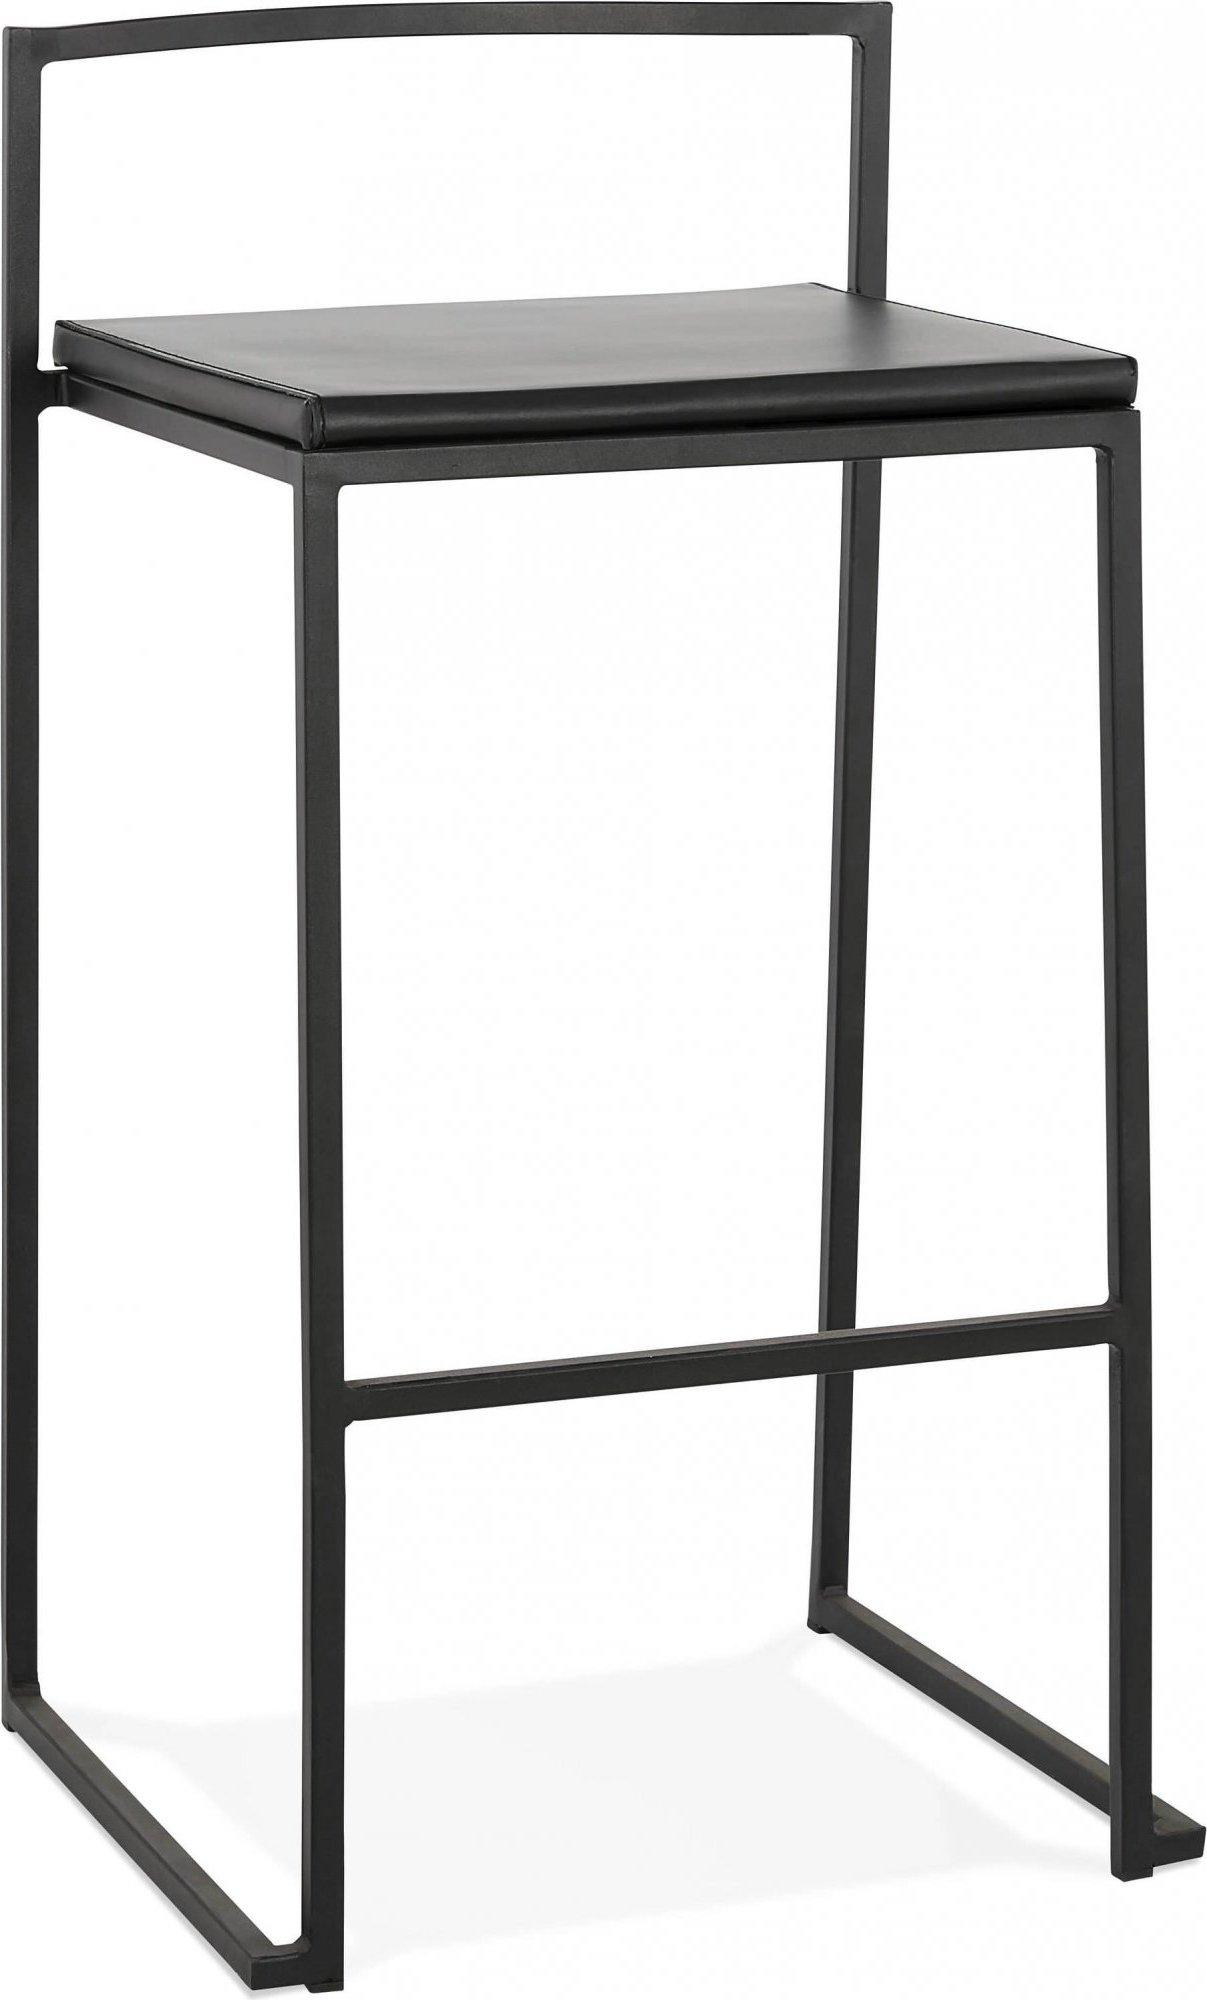 Tabouret de bar minimaliste imitation noir